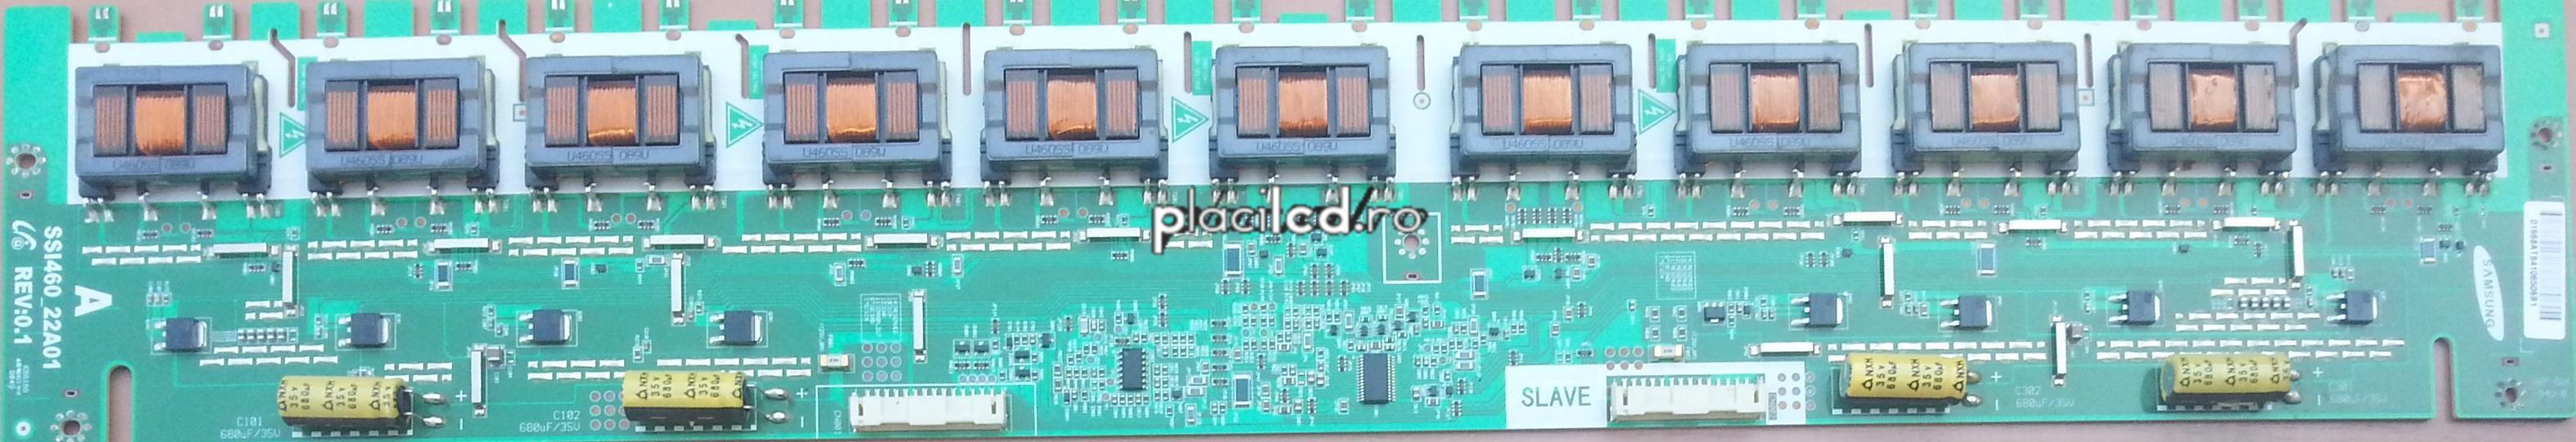 Placa invertoare model SSI460_22A01